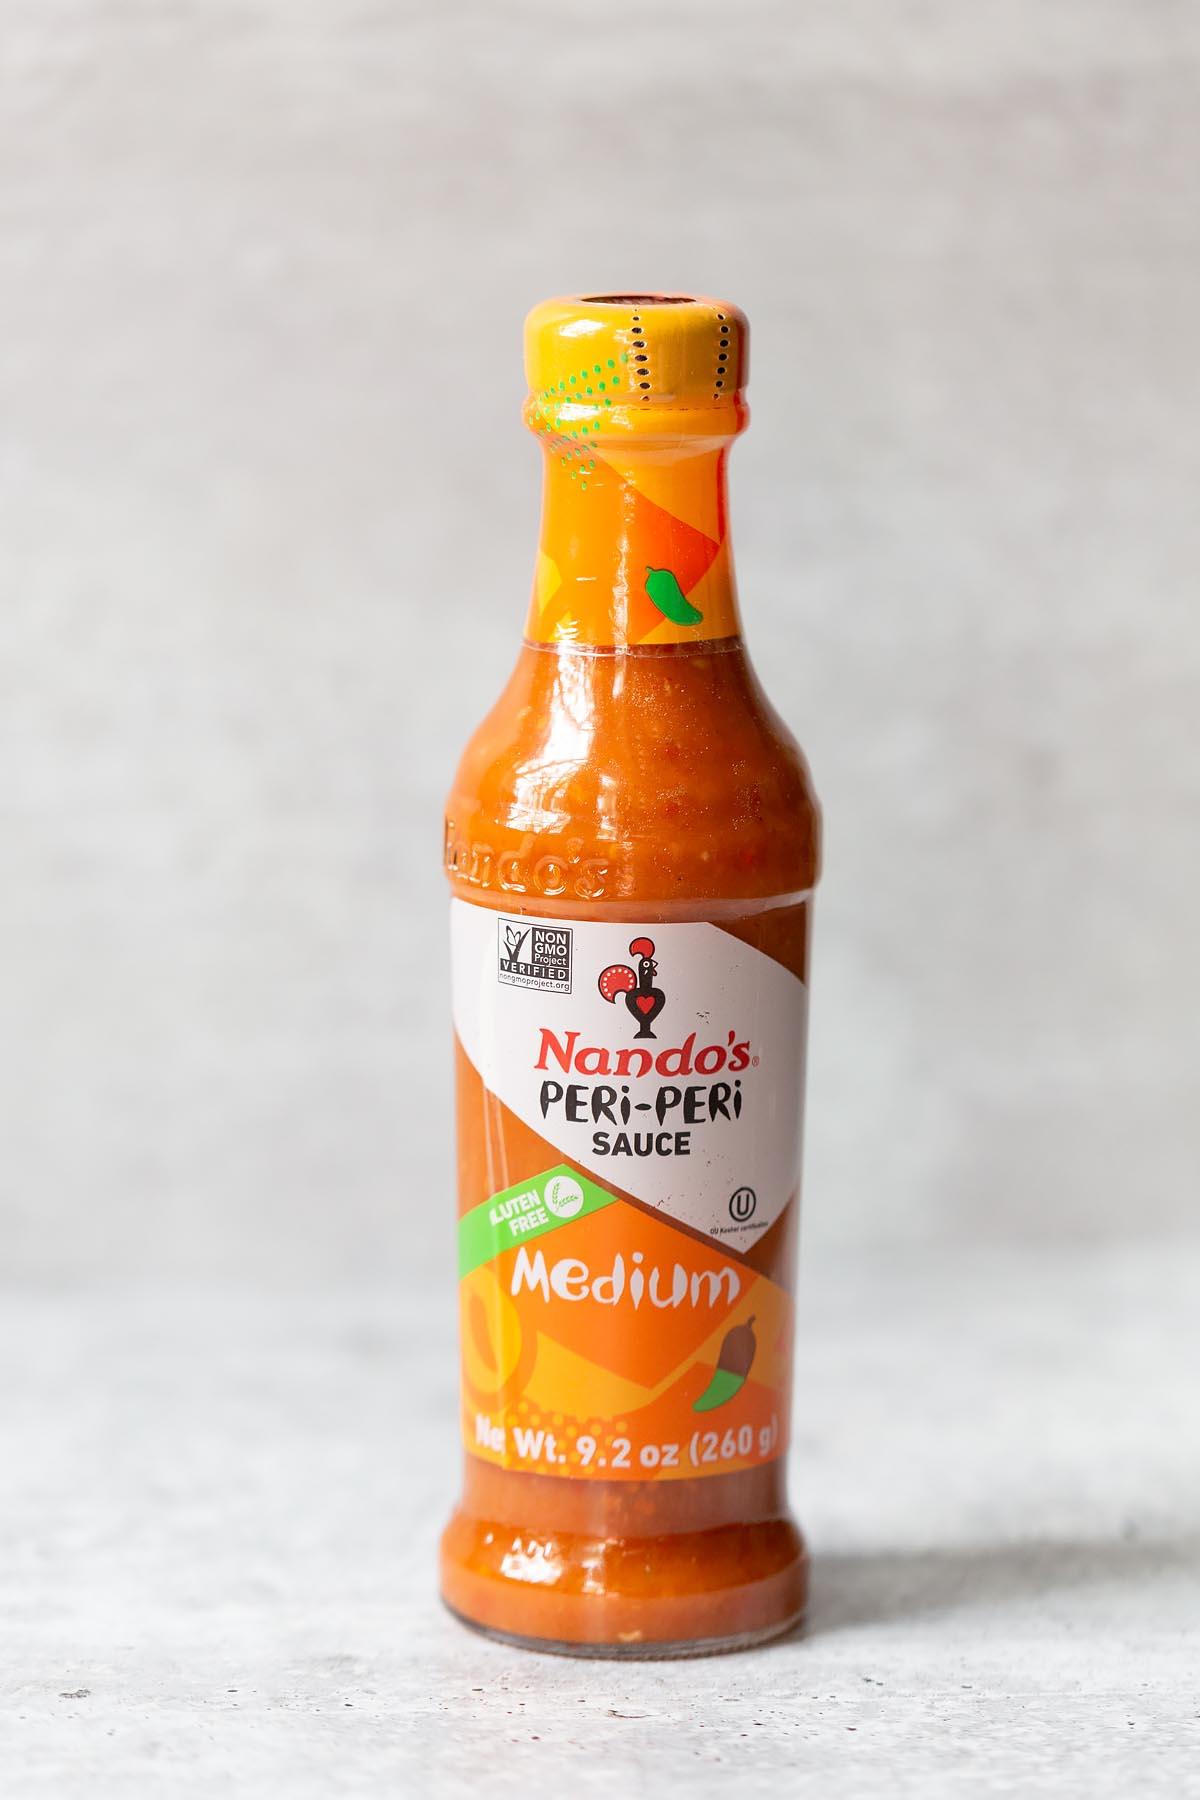 bottle of nandos peri peri sauce